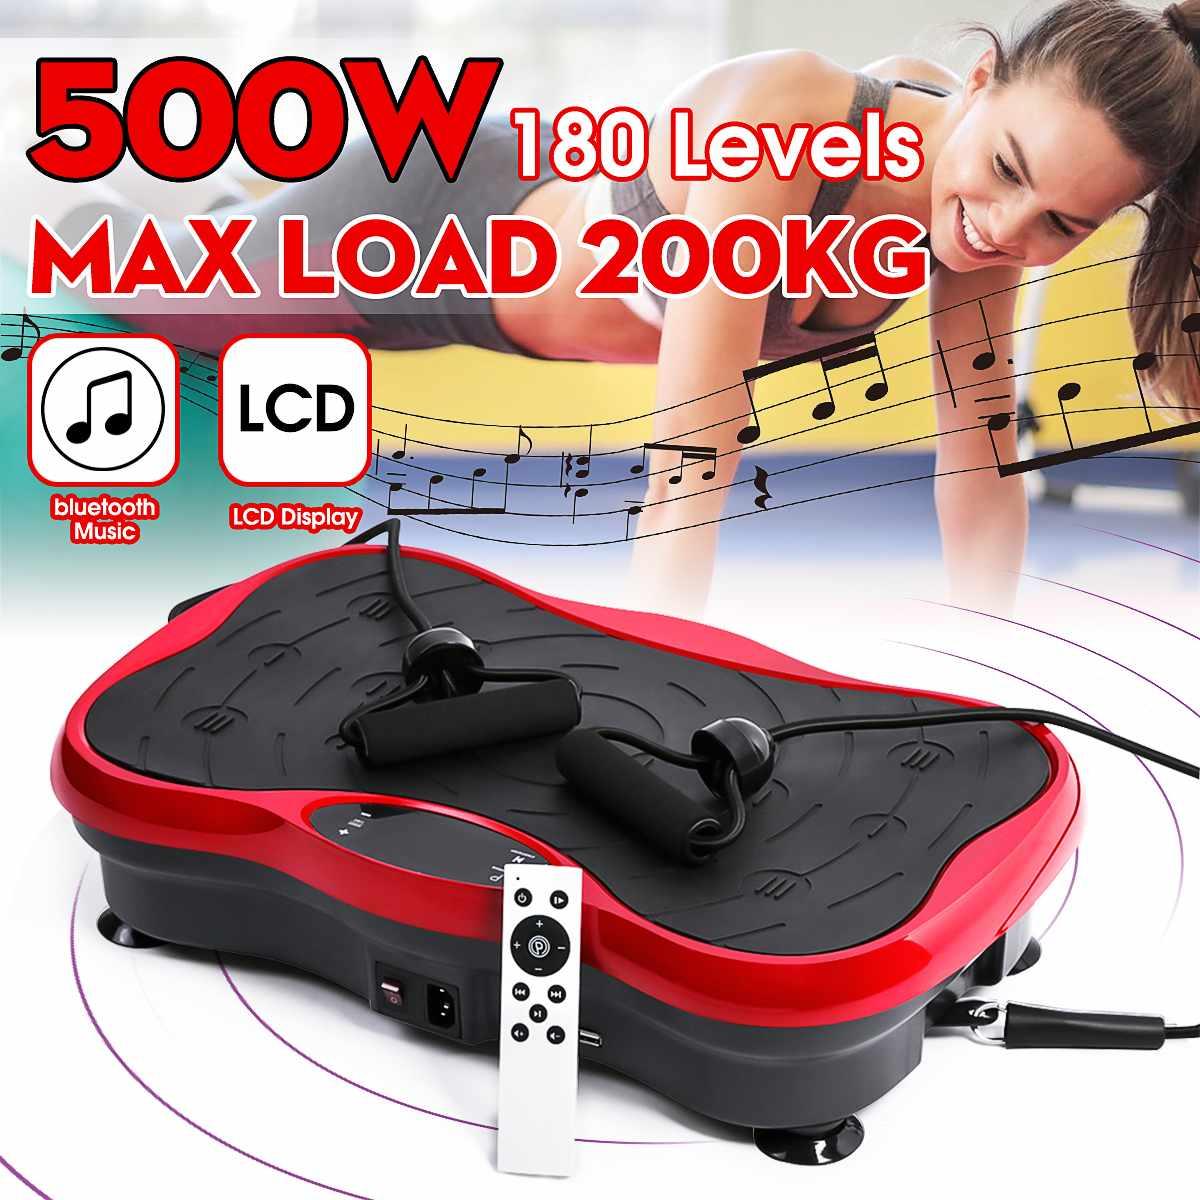 200KG/330lb Exercise Fitness Slim Vibration Machine Trainer Plate Platform Body Shaper Remote Control With Resistance Bands 500W